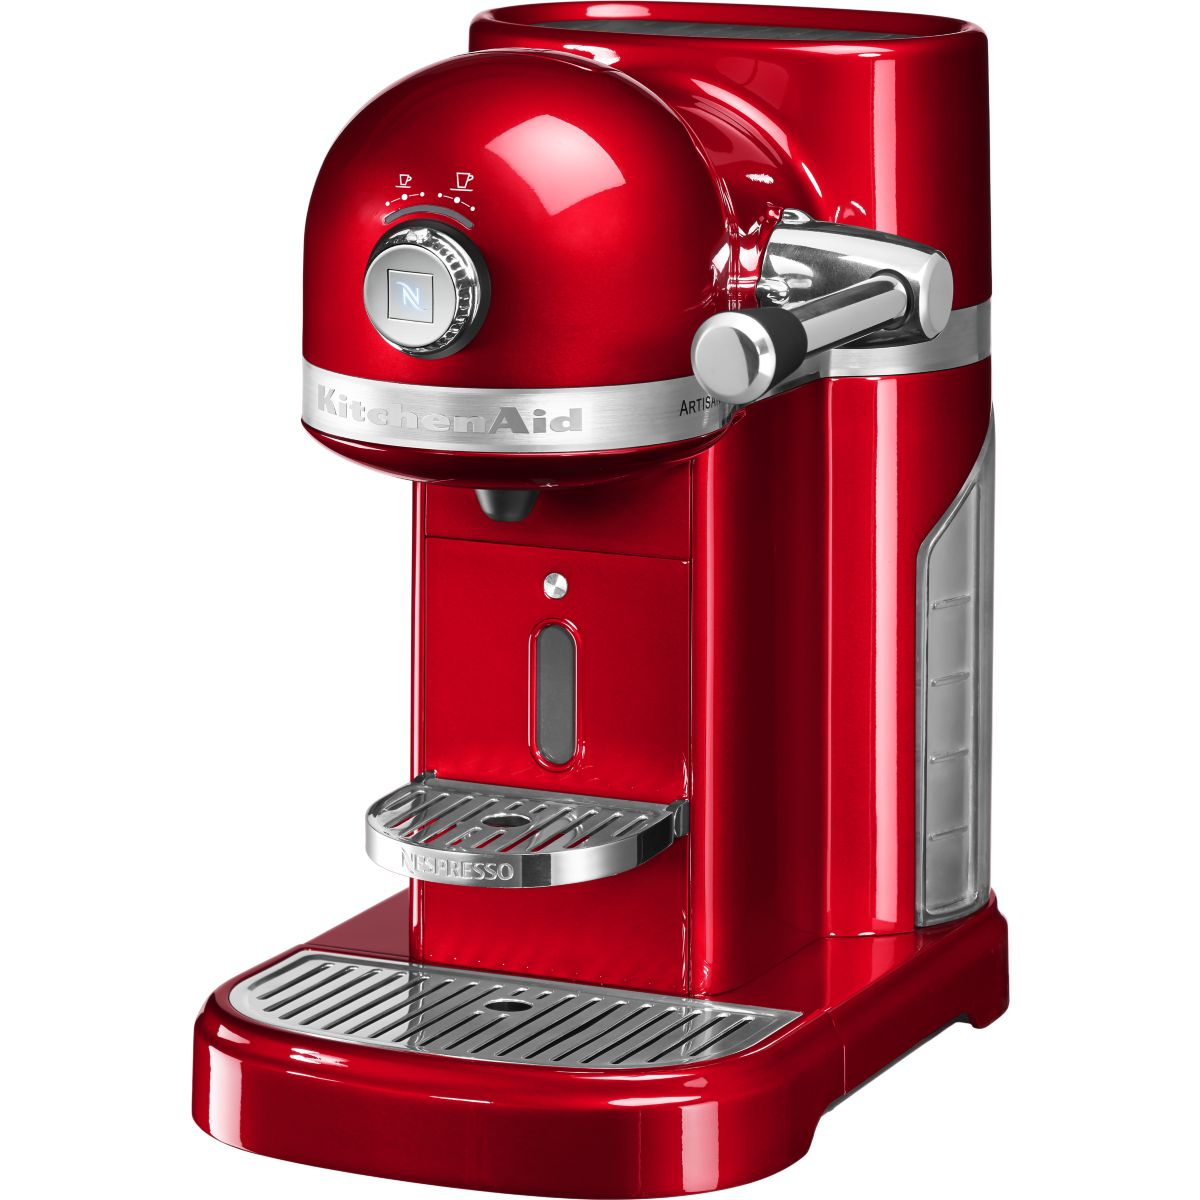 Nespresso KITCHENAID 5KES0503EER/5 Rouge Empire